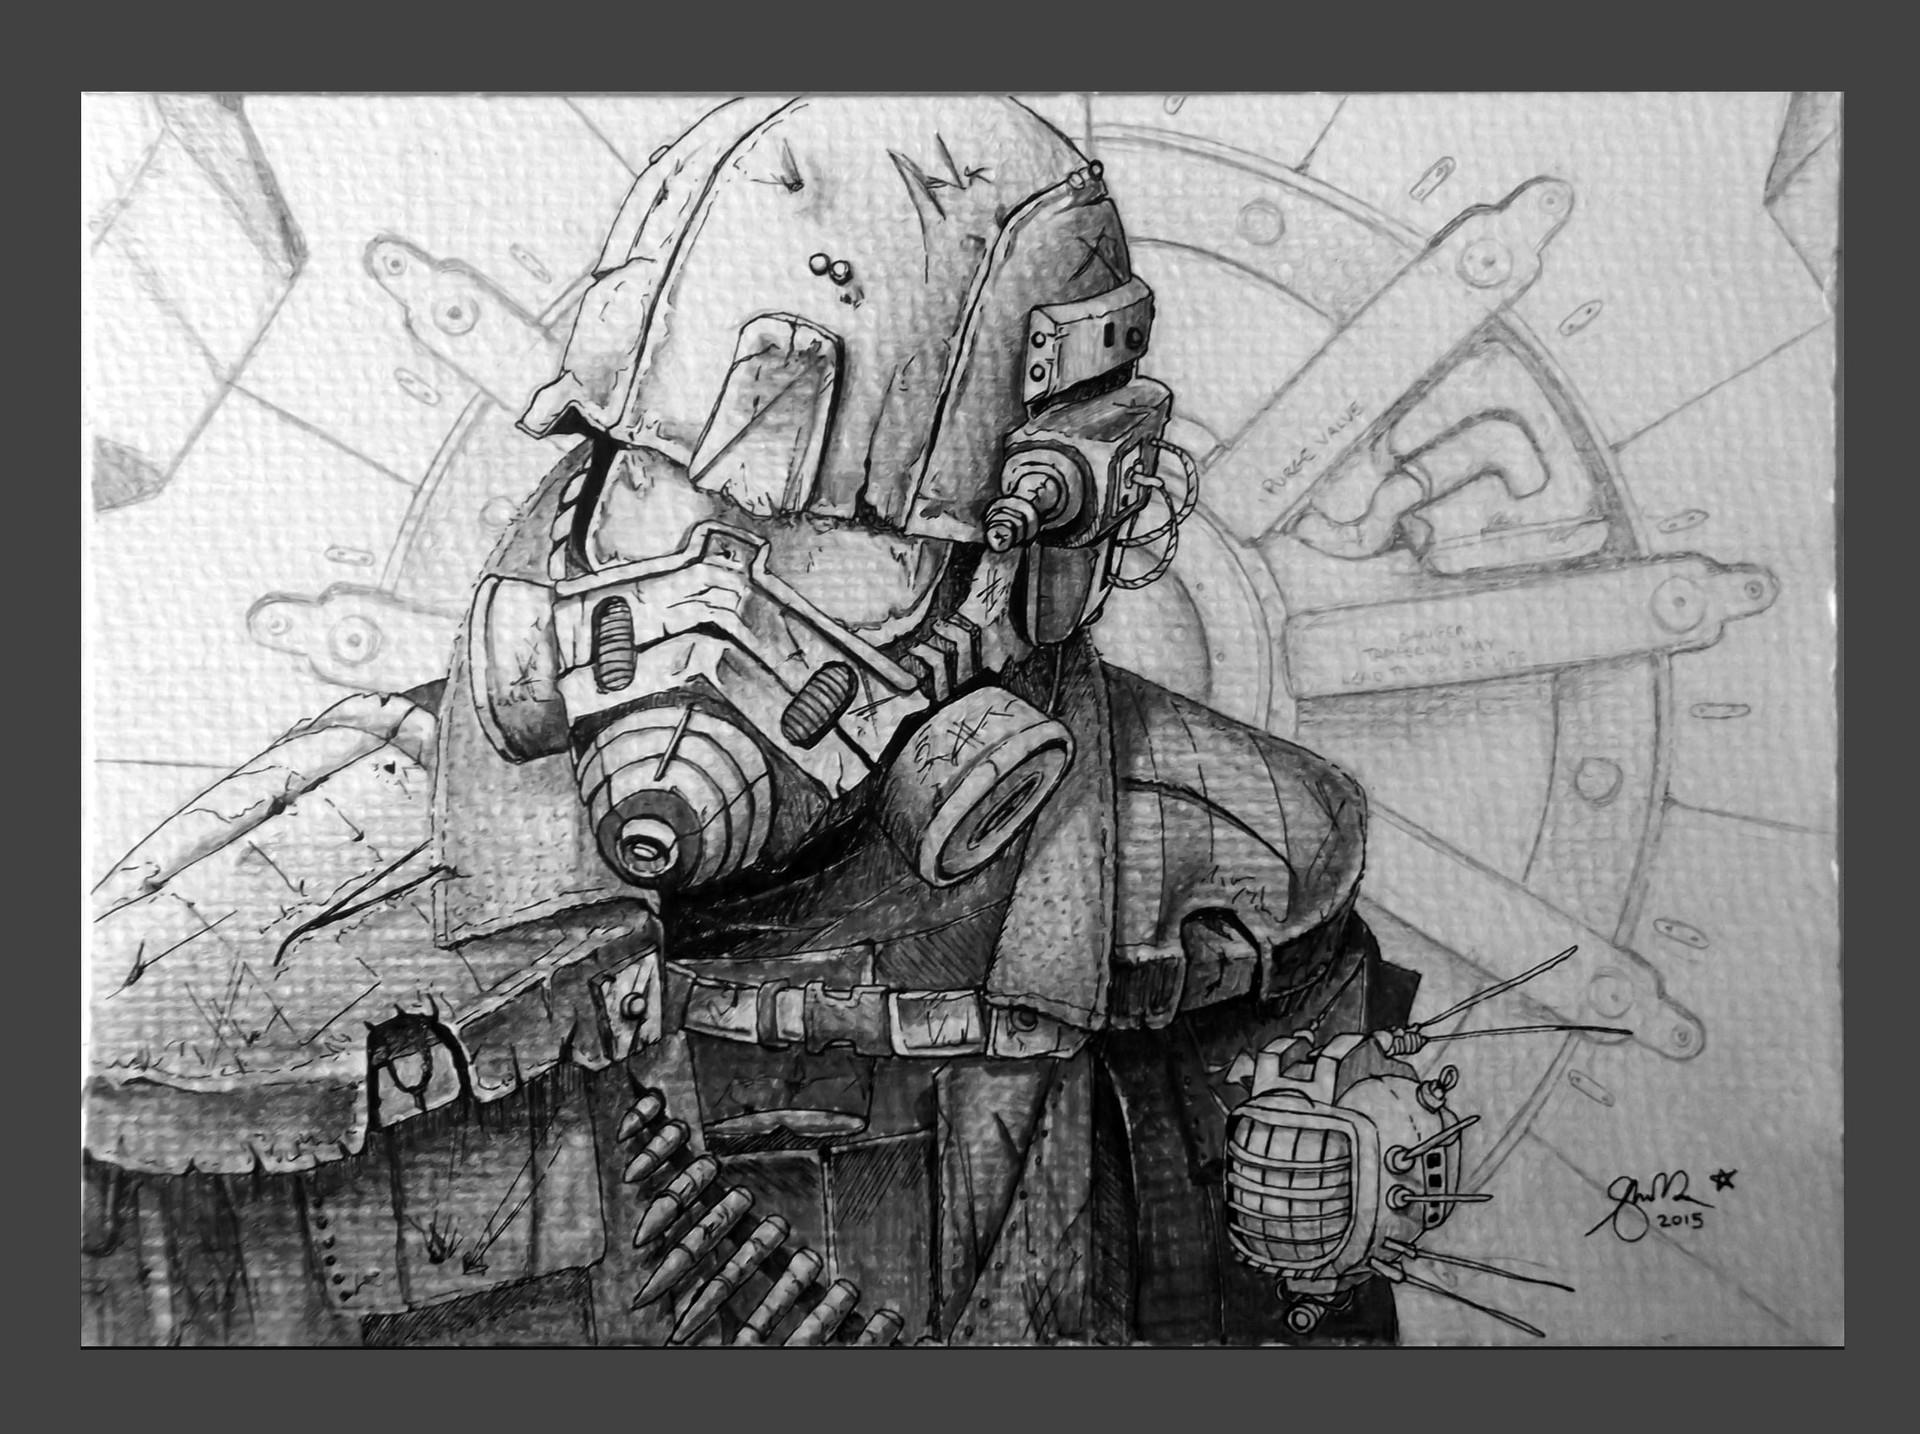 Shellz art fallout guy